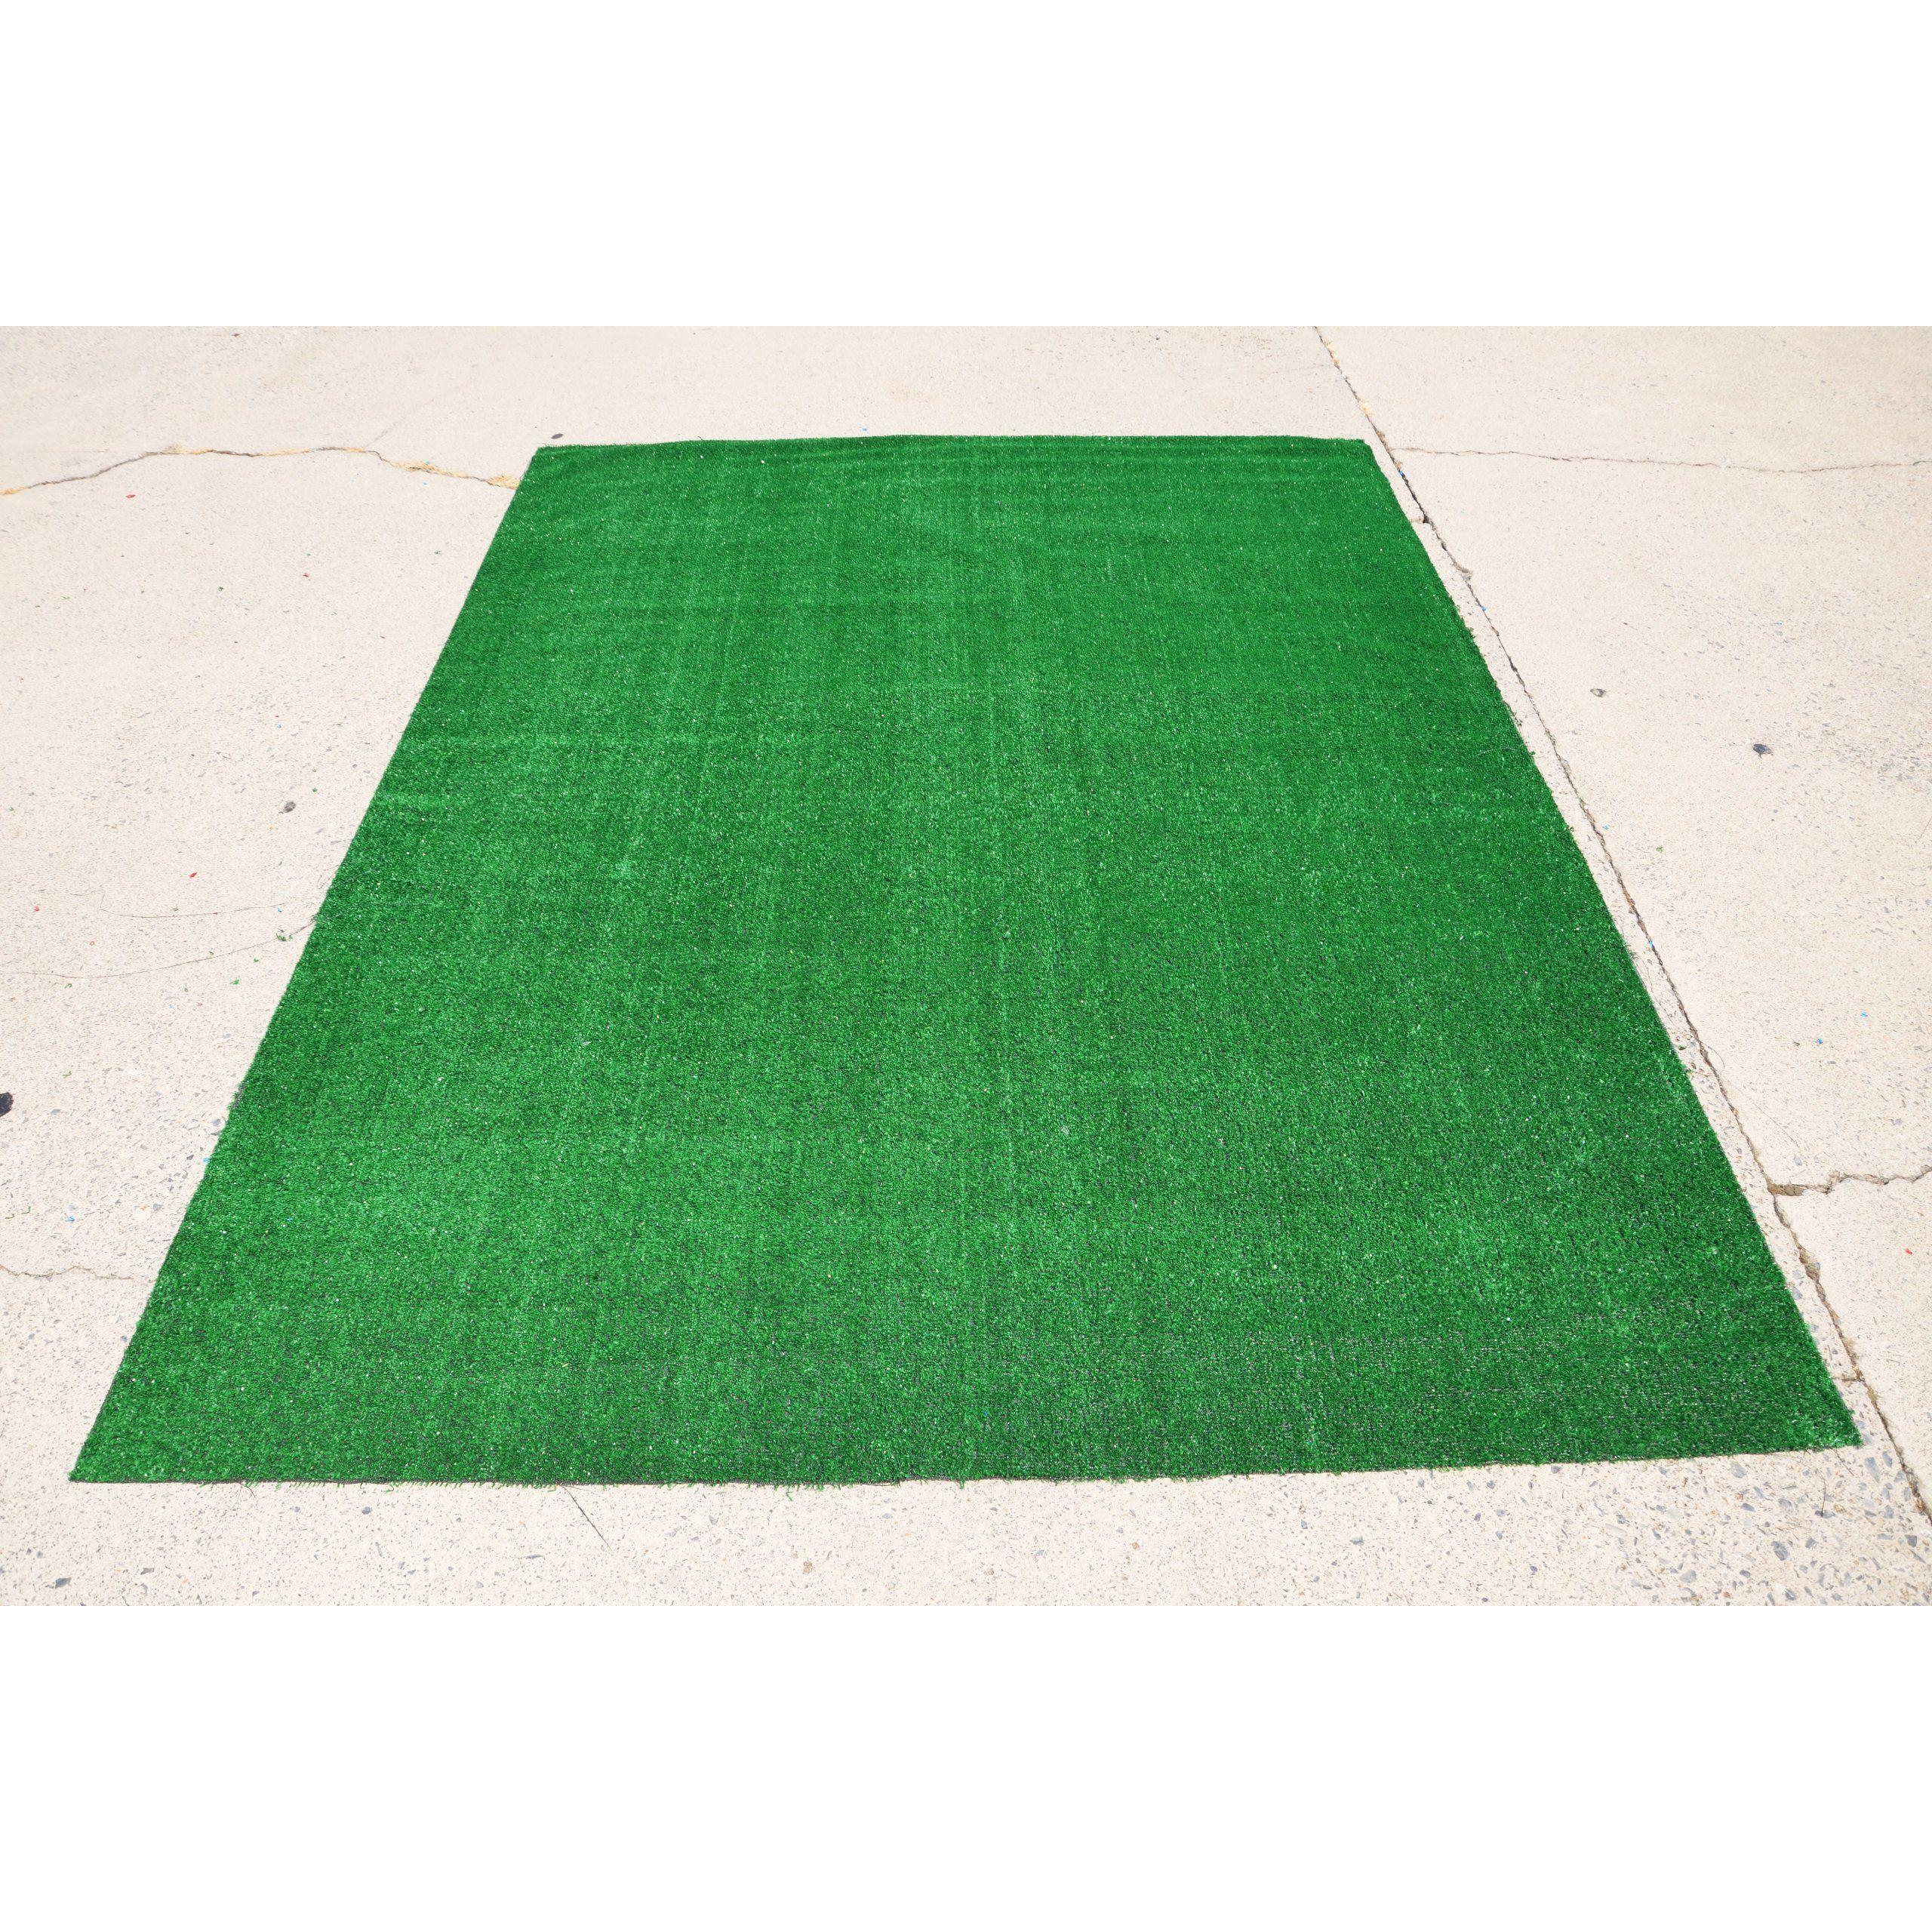 Dean Flooring Company Indoor Outdoor Green Artificial